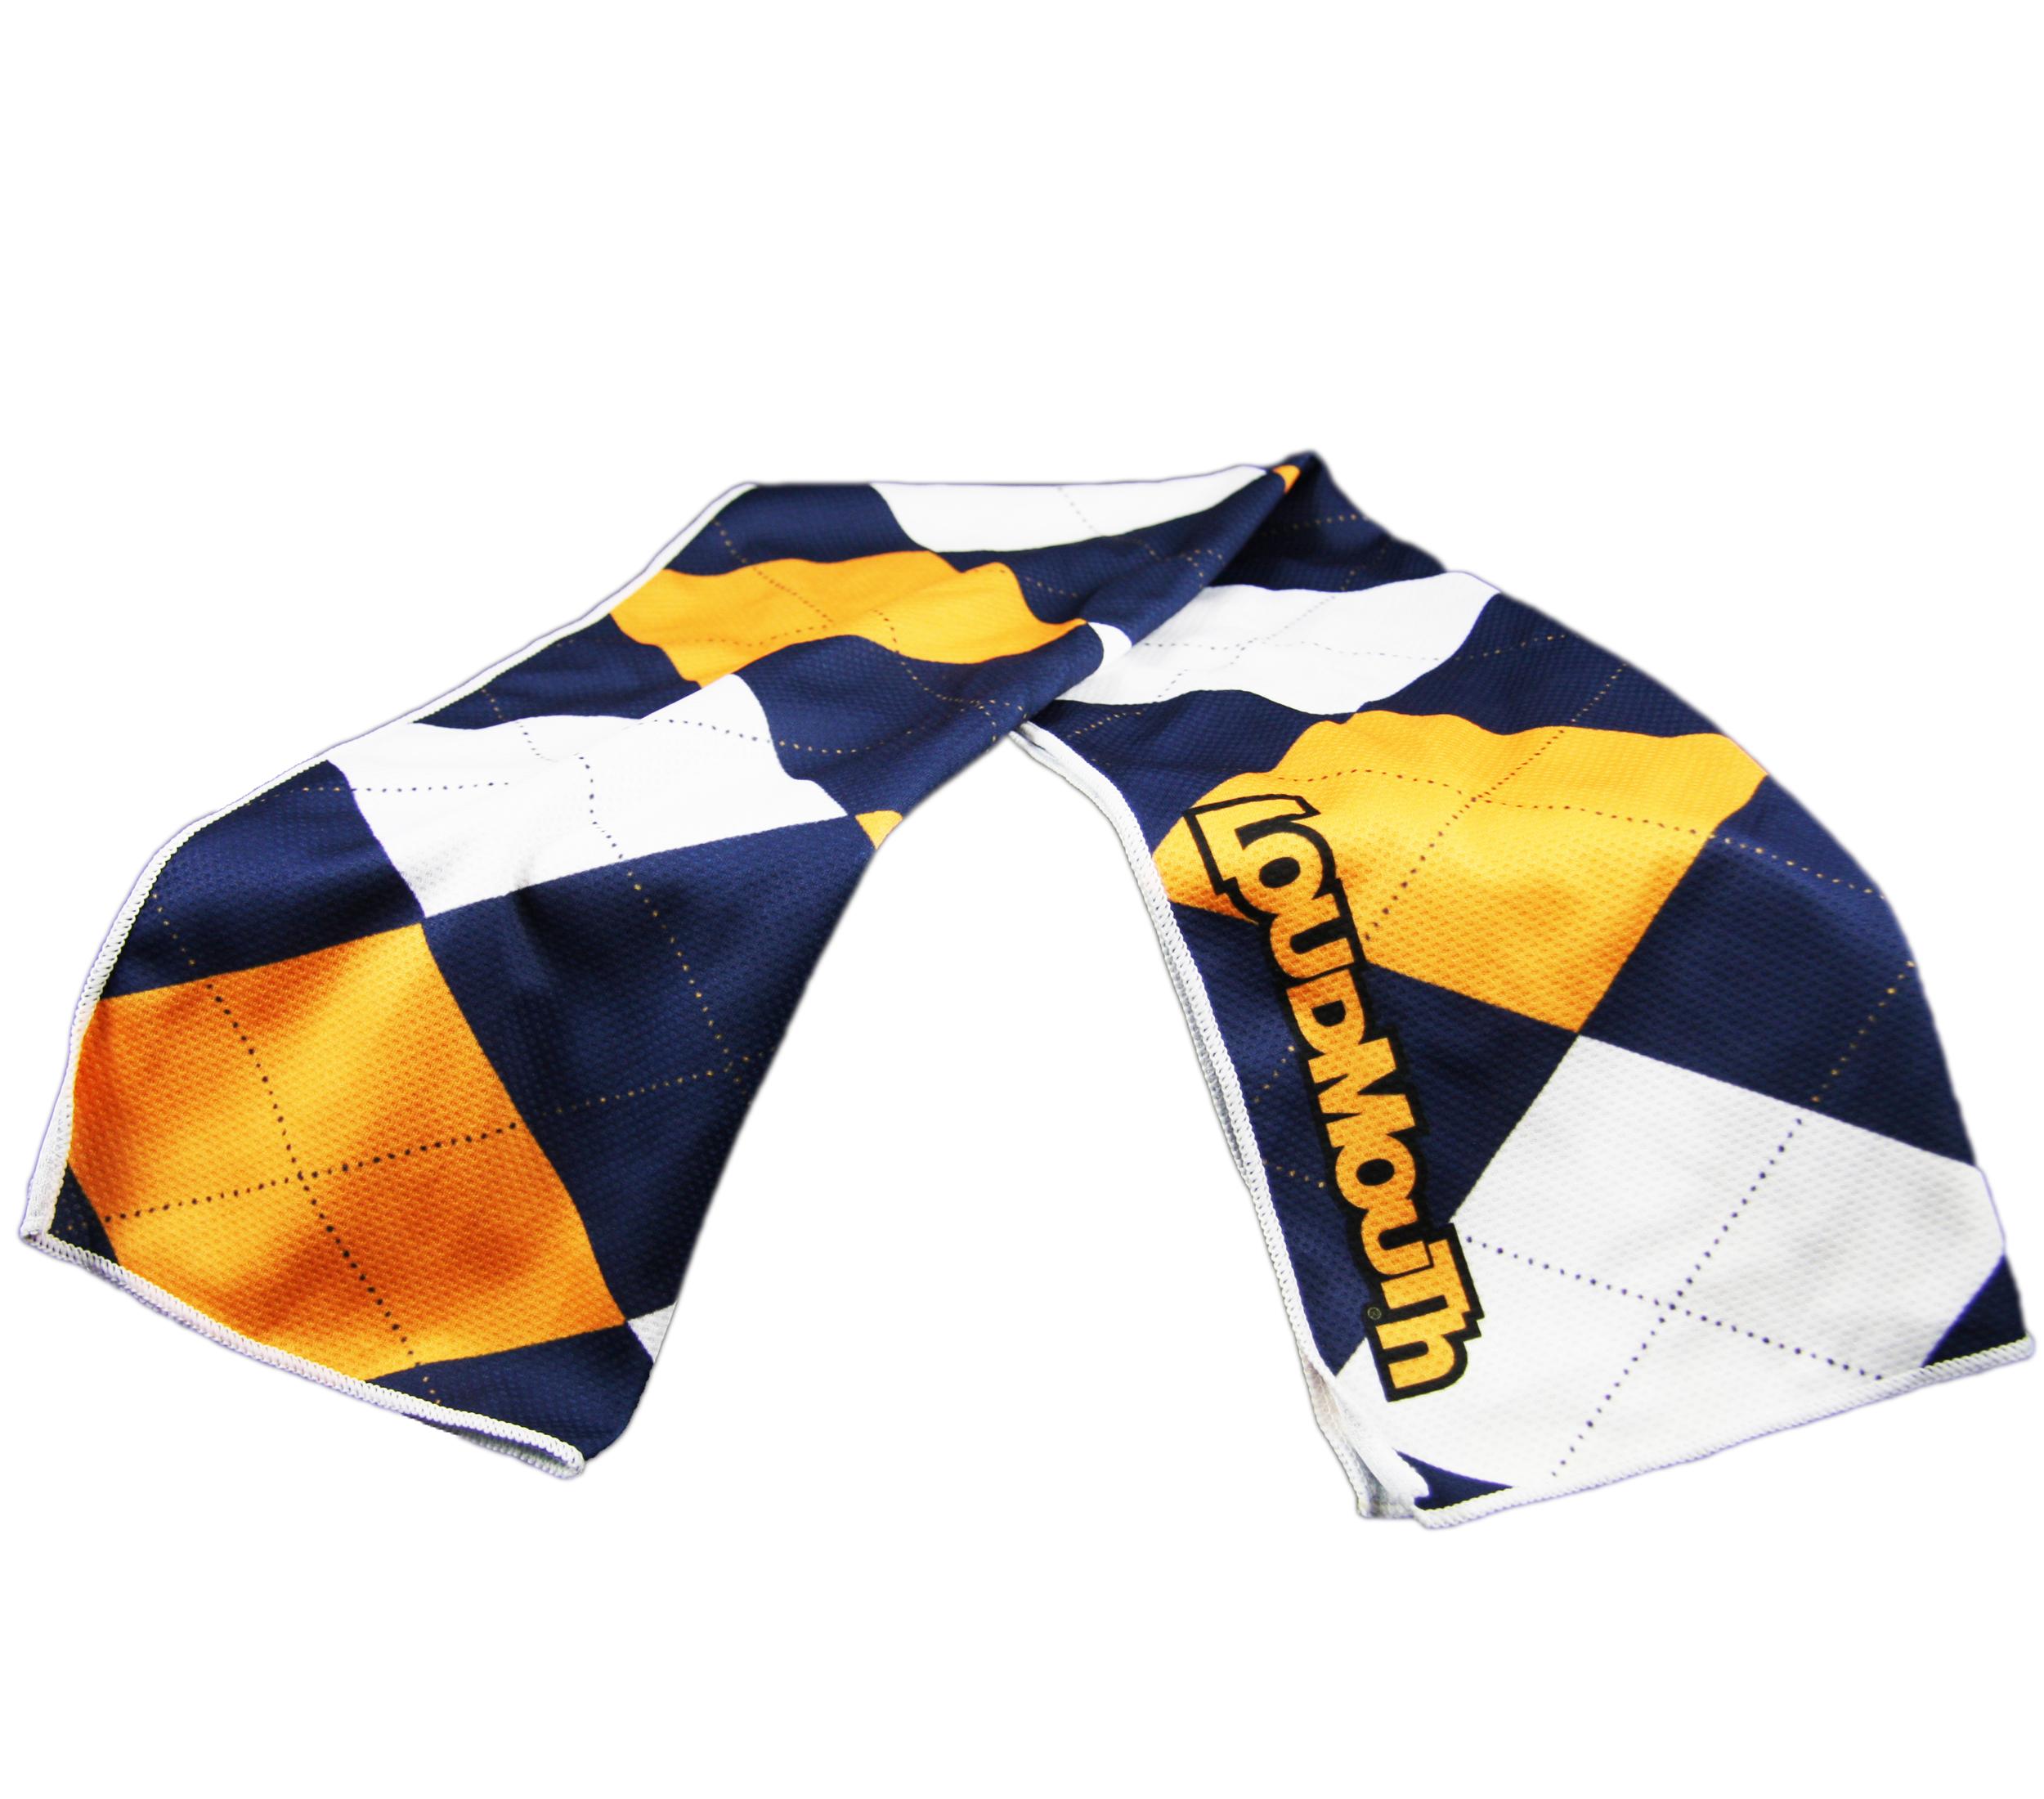 Loudmouth Cooling Towels - Blue & Gold Mega -